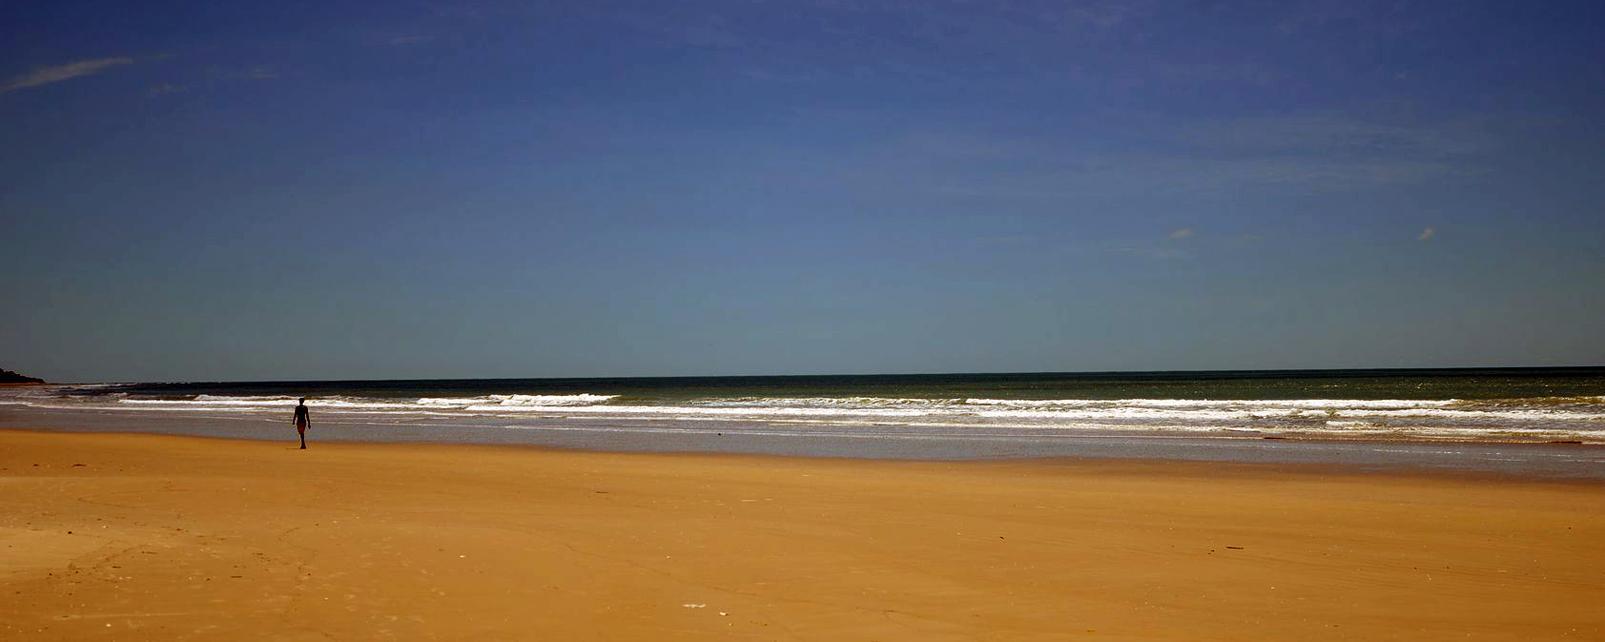 Afrique; Sénégal; Cap Skirring;